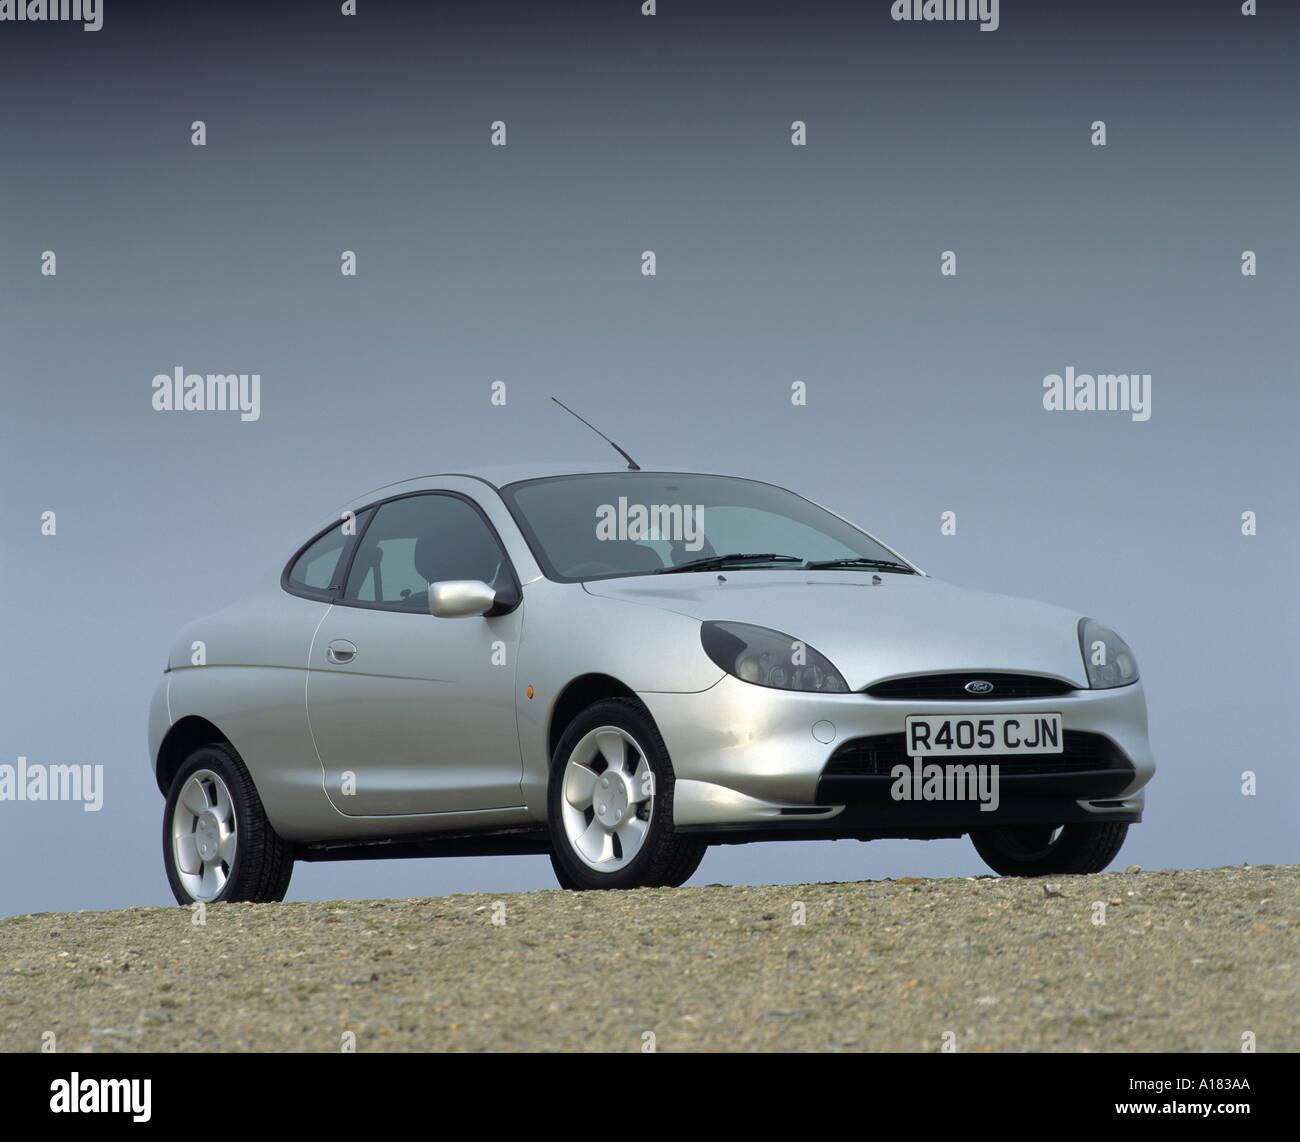 1998 Ford Puma - Stock Image